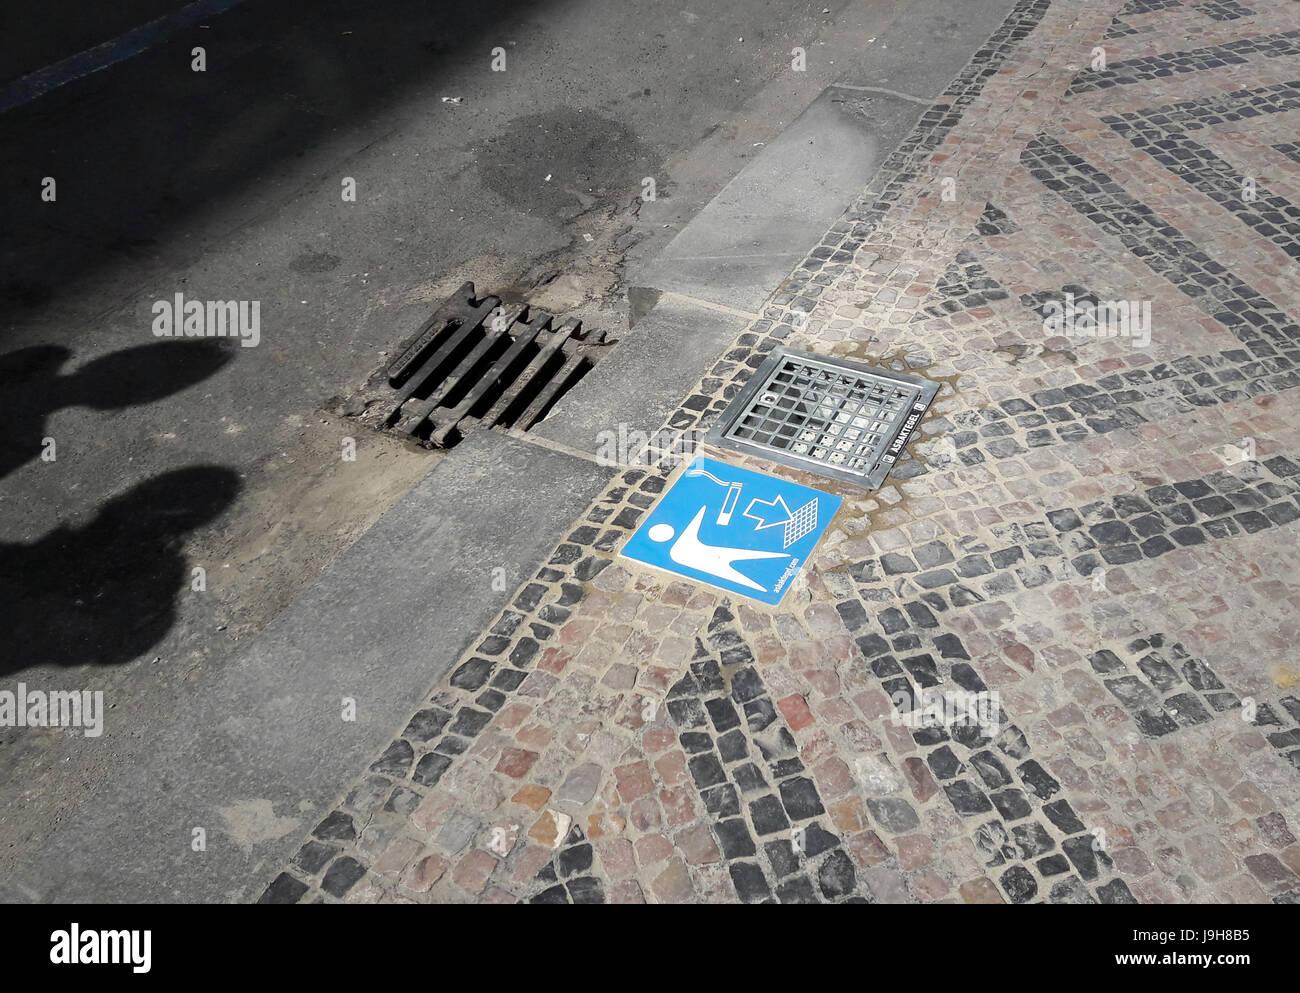 The Prague Municipal Office install the first ashtray into a pavement at Veleslavinova Street in Prague, Czech Republic, - Stock Image